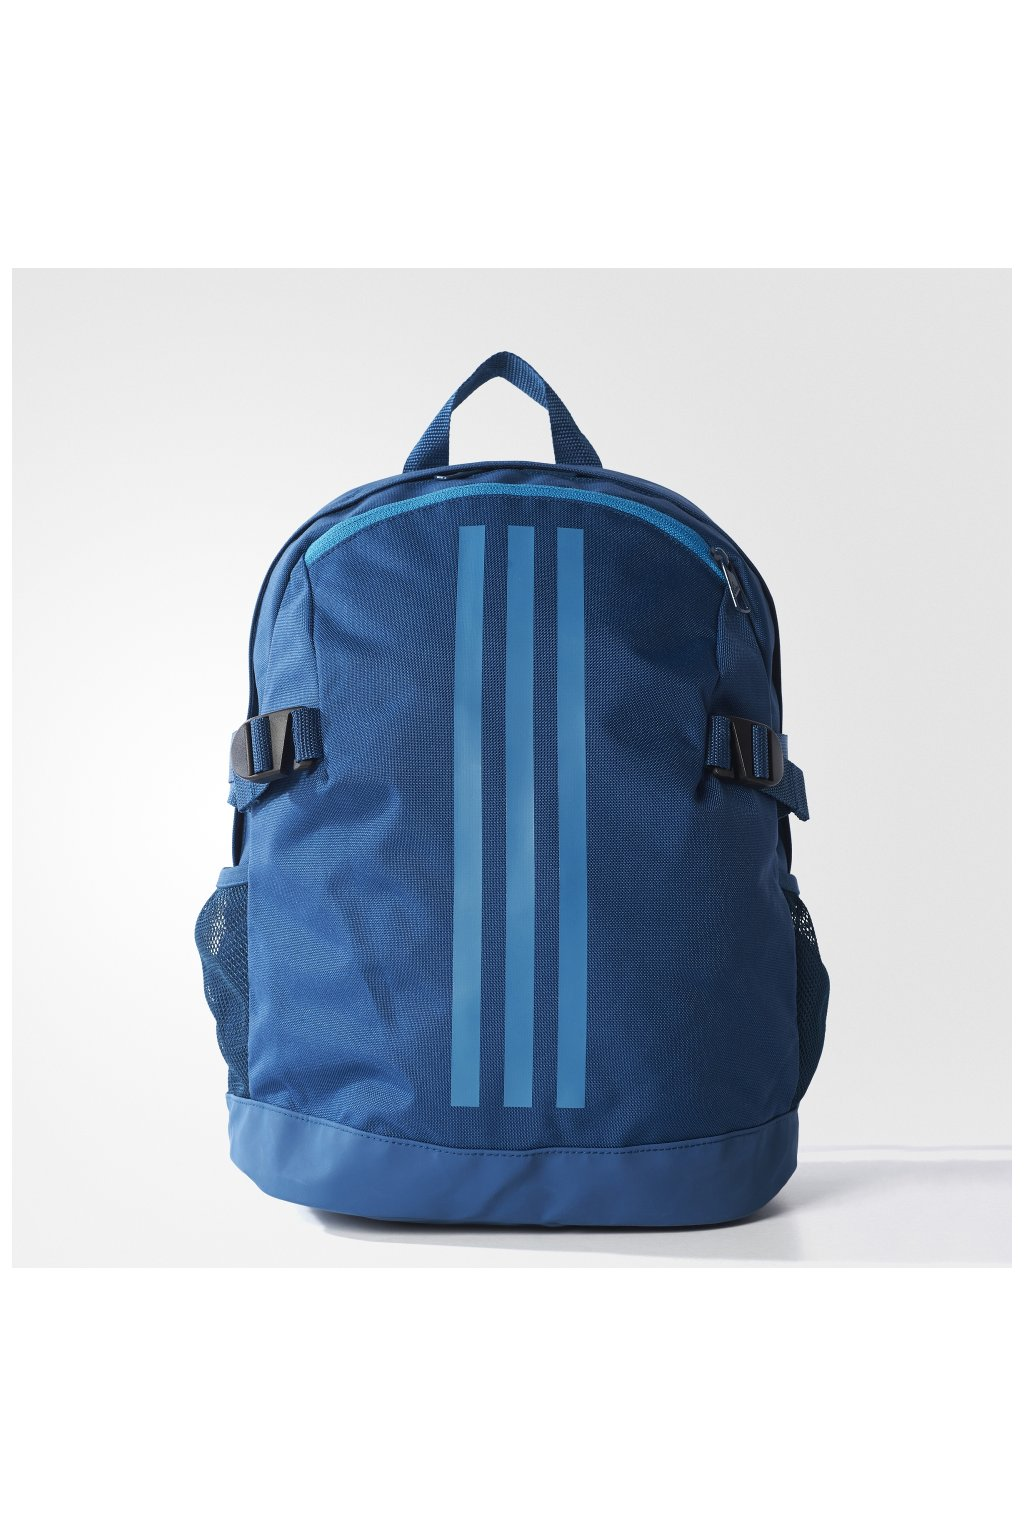 cd1176 batoh adidas backpack power 3s